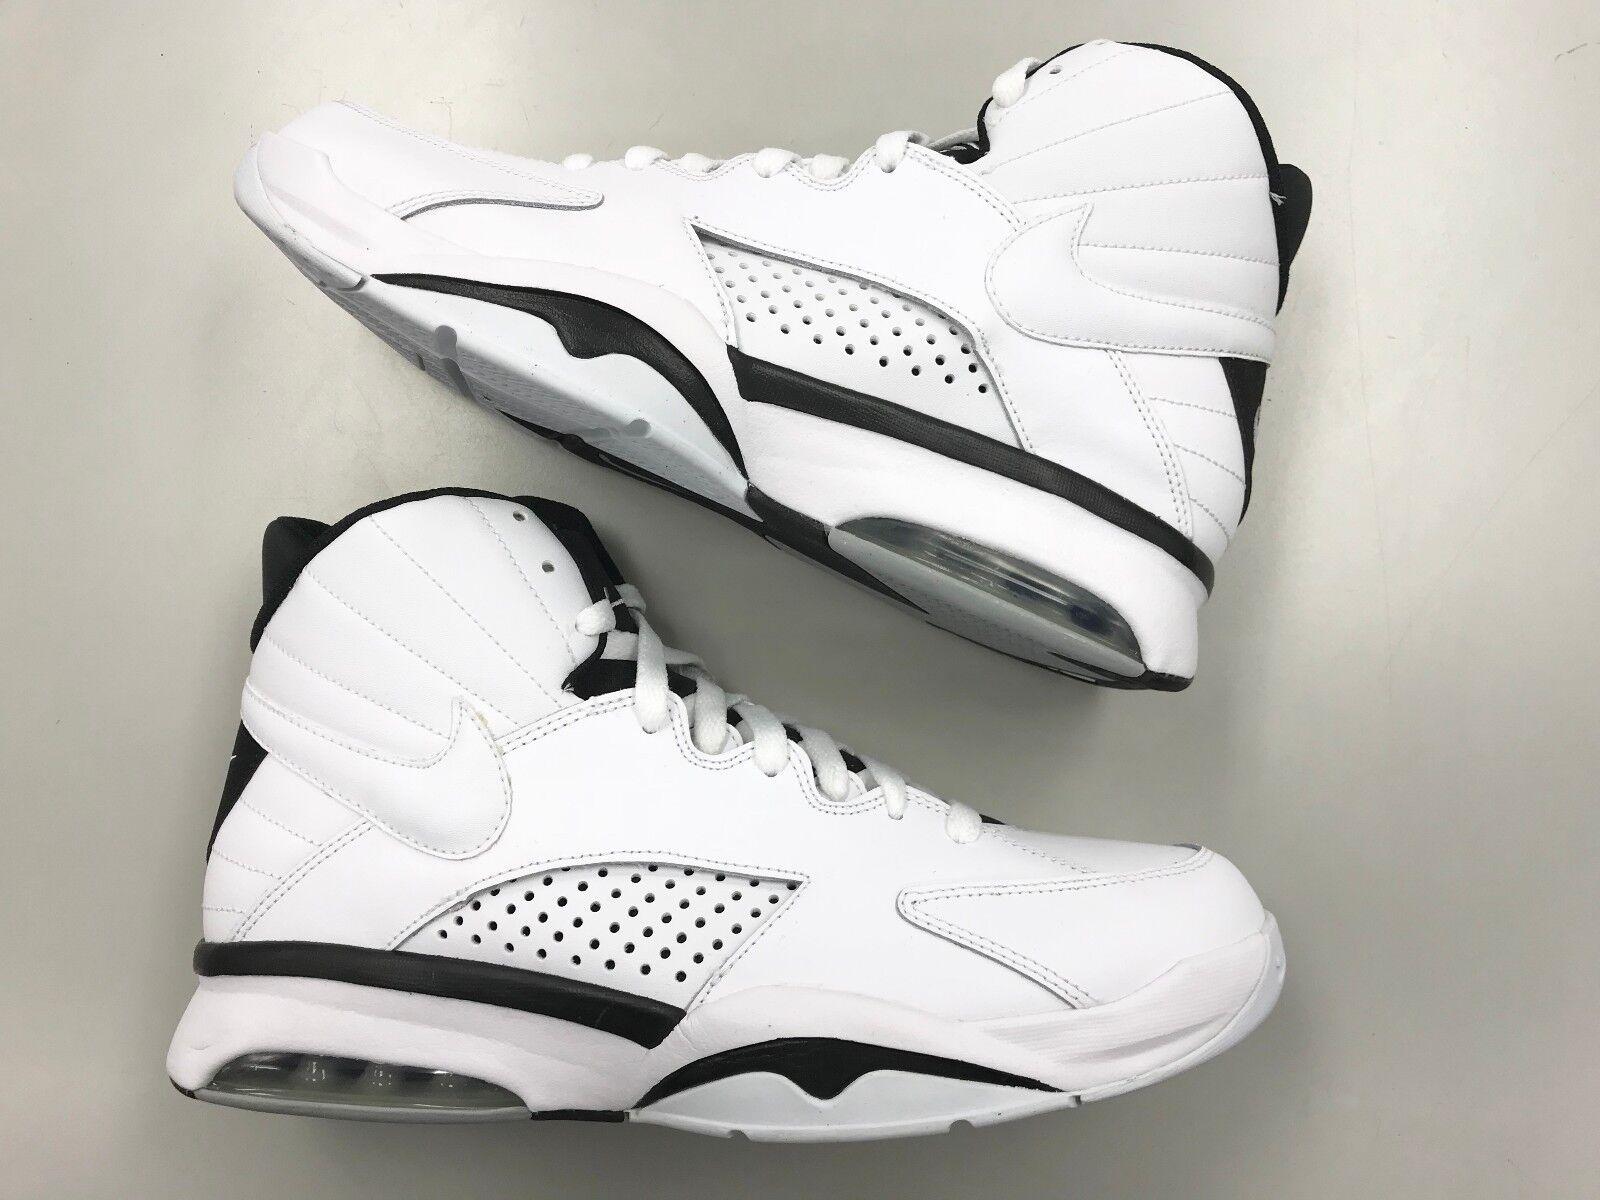 Brand New Nike Air Maestro Flight retro Scottie Pippen shoes men vtg max uptempo